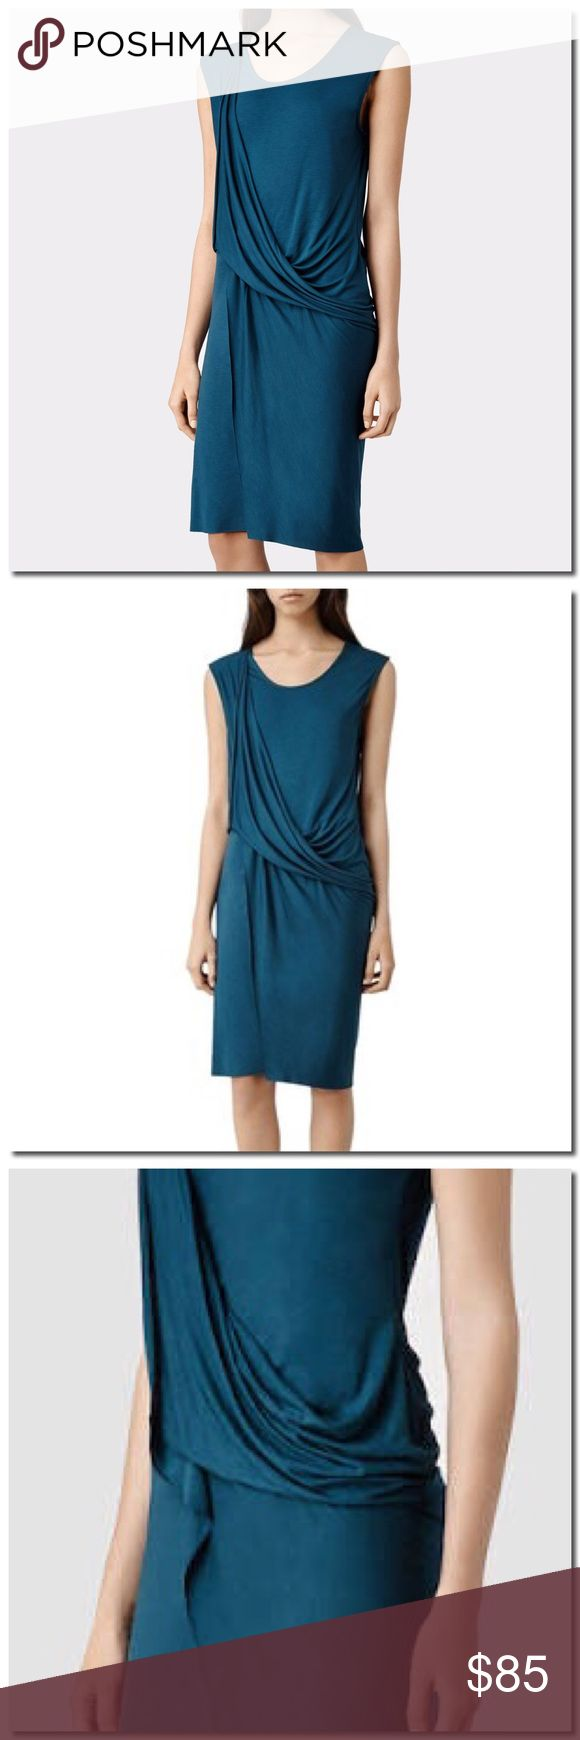 SALE All Saints Dress 146,147 Sleeveless, above the knee, twisted front drape. Slim fitting. Viscose jersey. Delicate wash. Raw hem All Saints Dresses